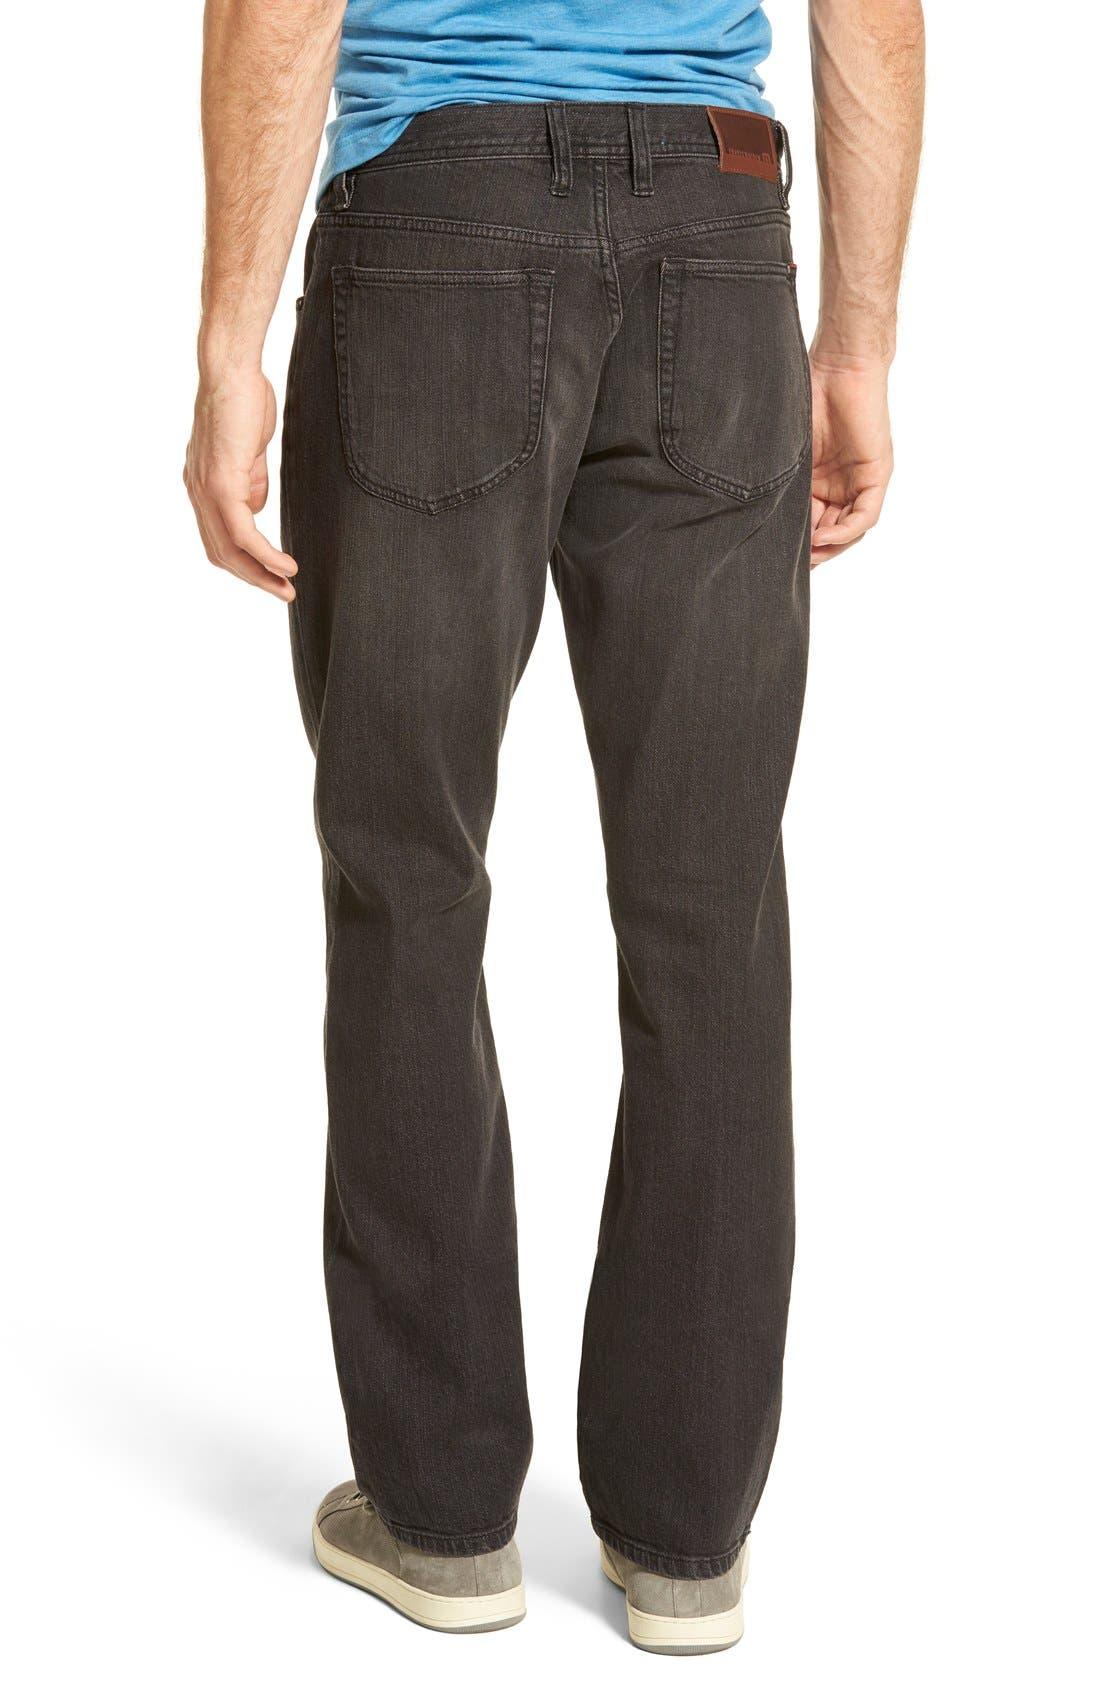 'Duke' Relaxed Fit Jeans,                             Alternate thumbnail 2, color,                             002